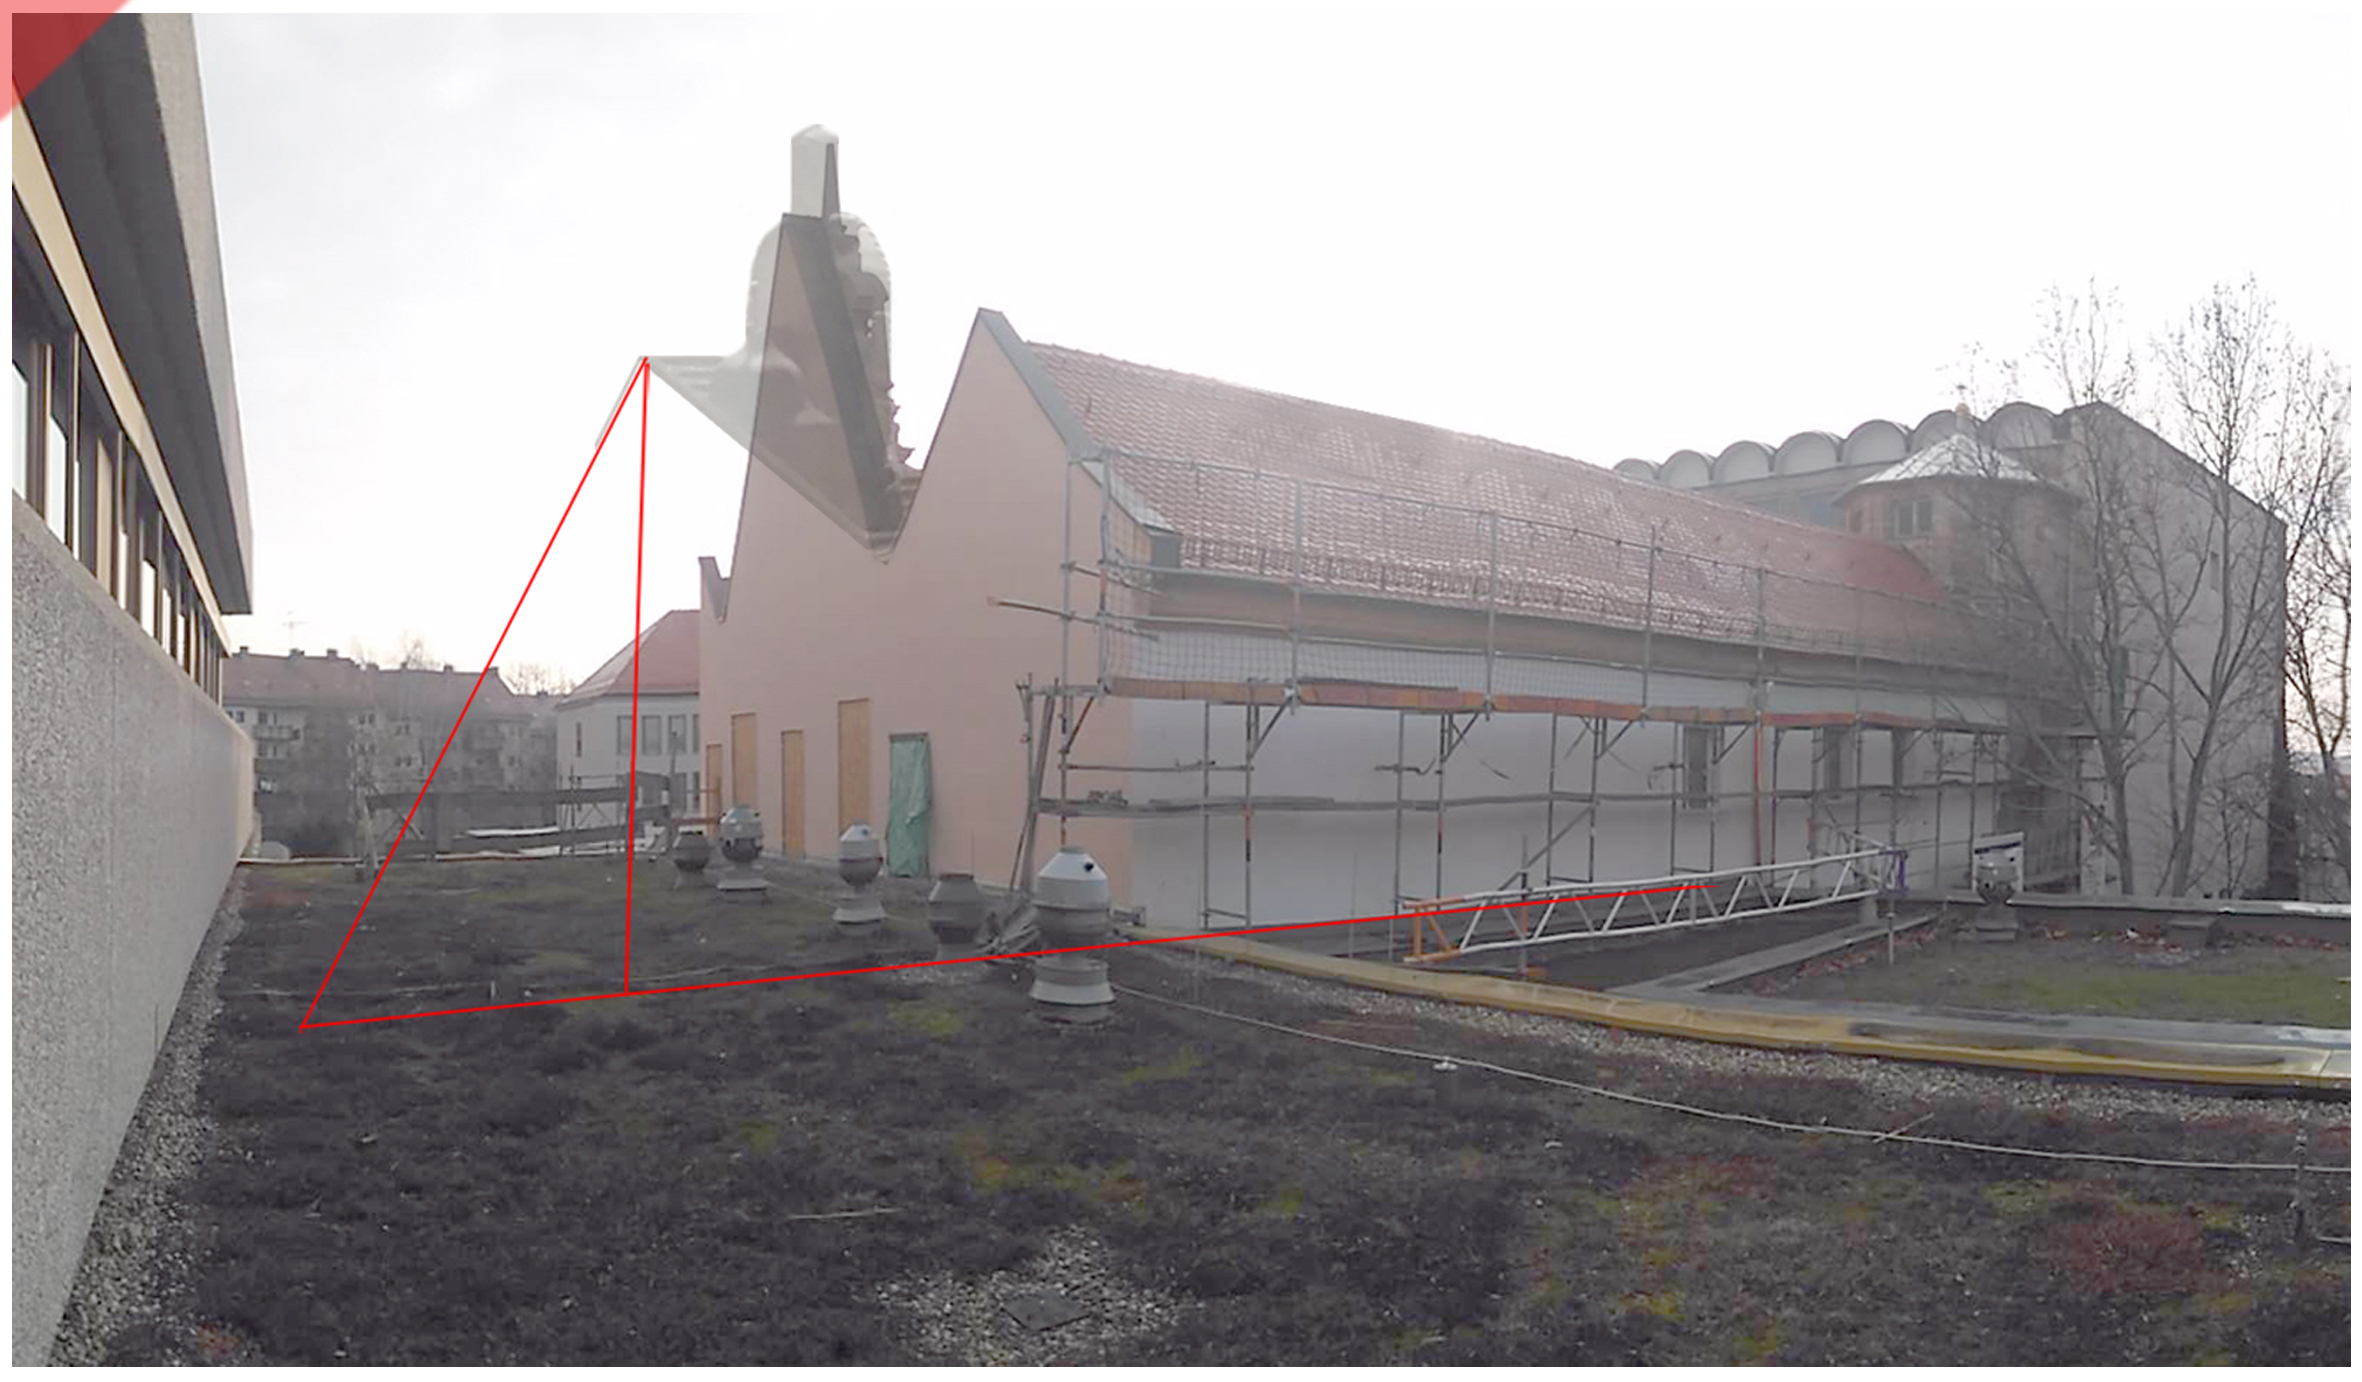 Pellerhaus-Nordgiebel-Innenhof-Dach-Panorama-Hof-Rekonstruktion-Fassade-2019